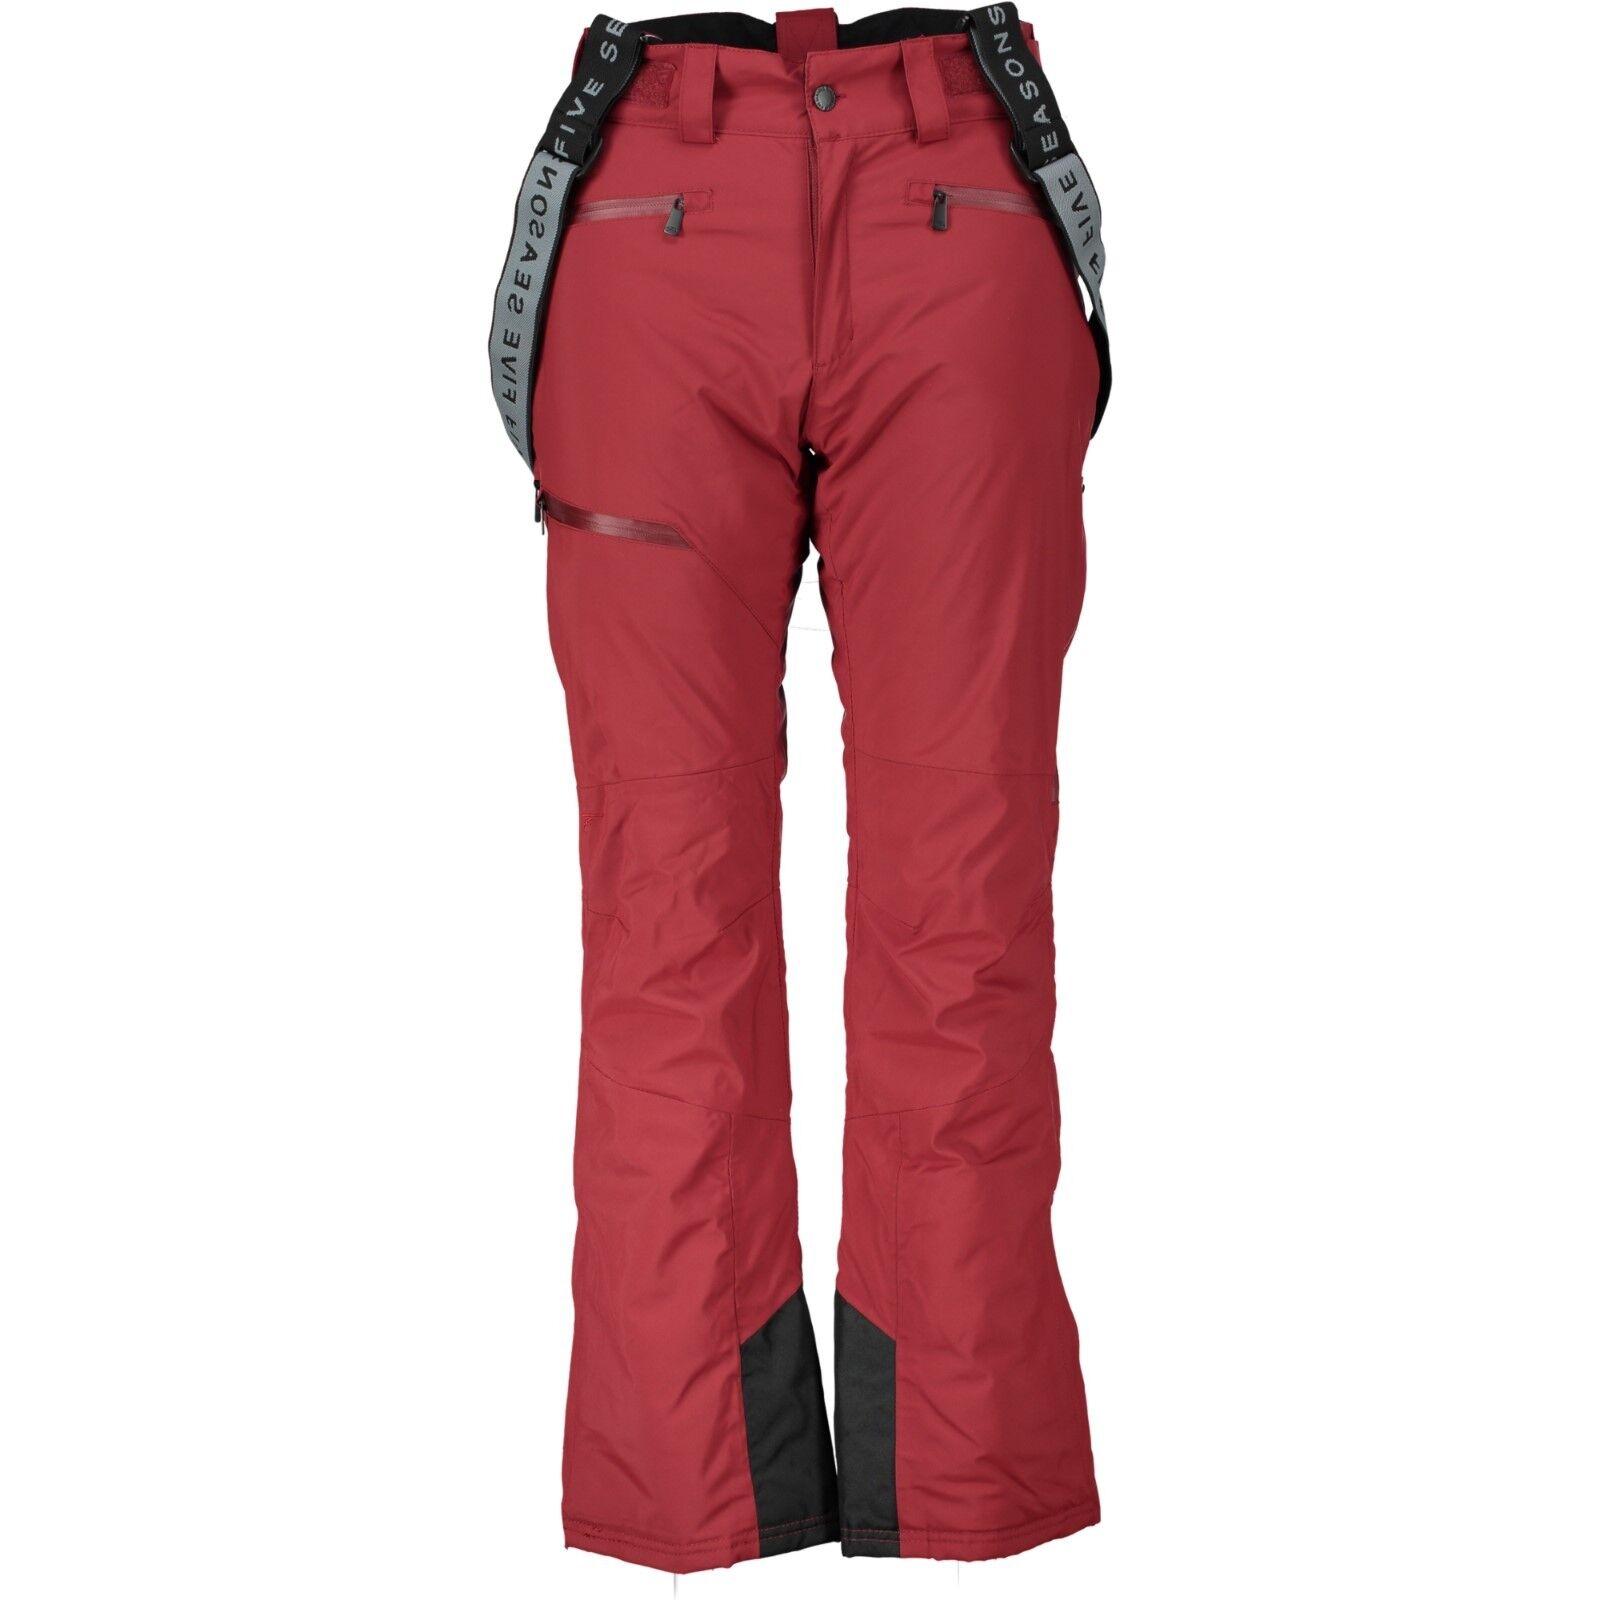 Five Seasons Esin Pantalones Mujer Pantalones Esquí para Mujer Forrado Rojo